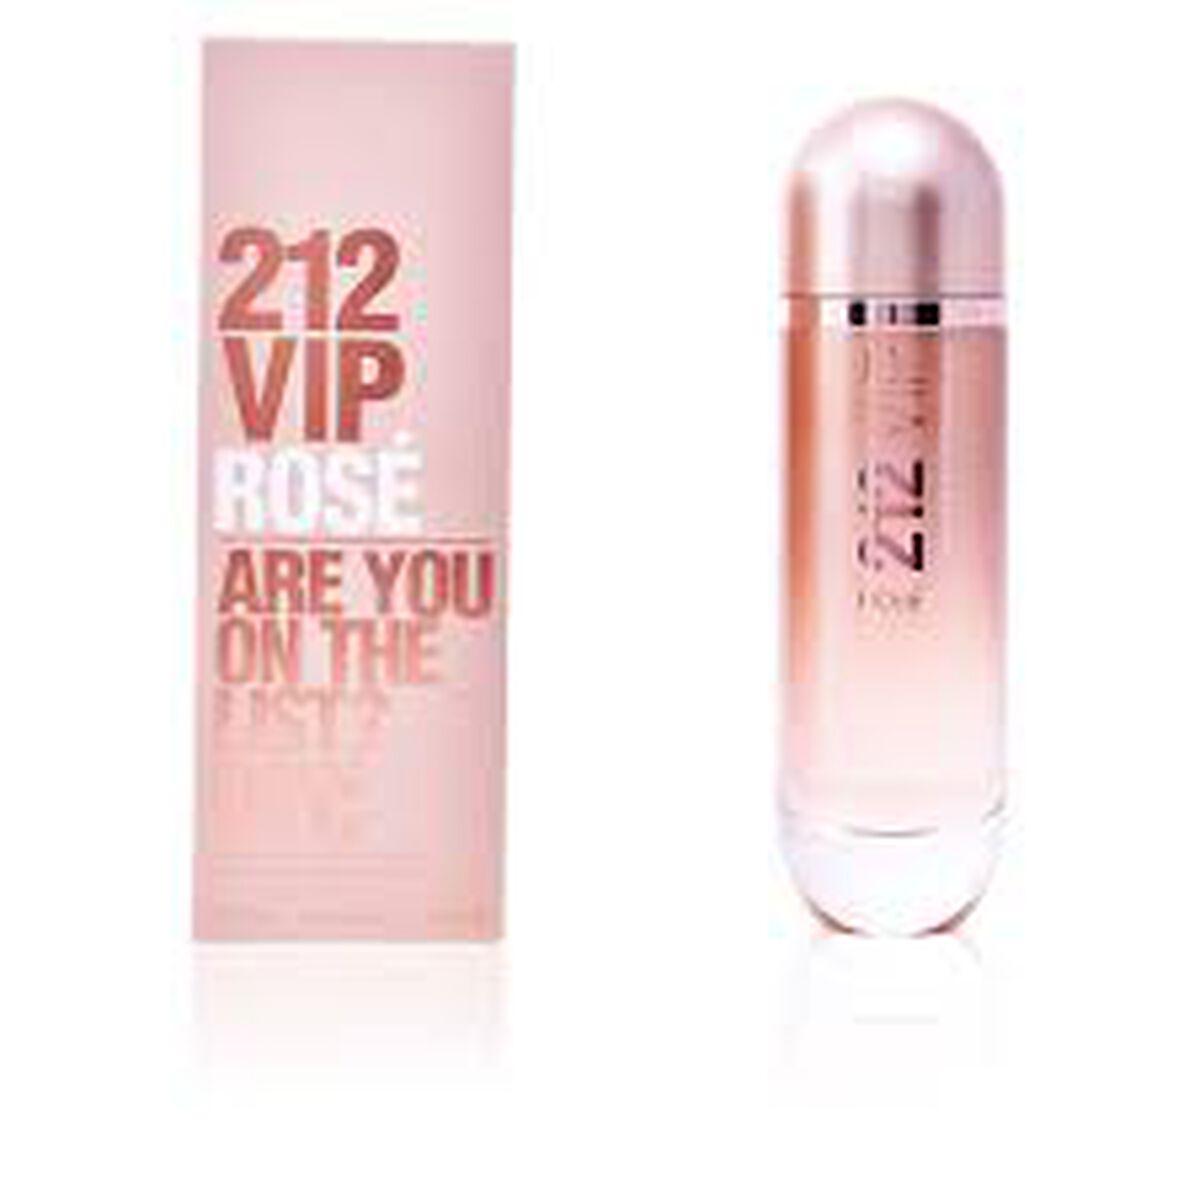 Estuche 212 VIP Rose (EDP 50ml + Body Lotion 75ml)